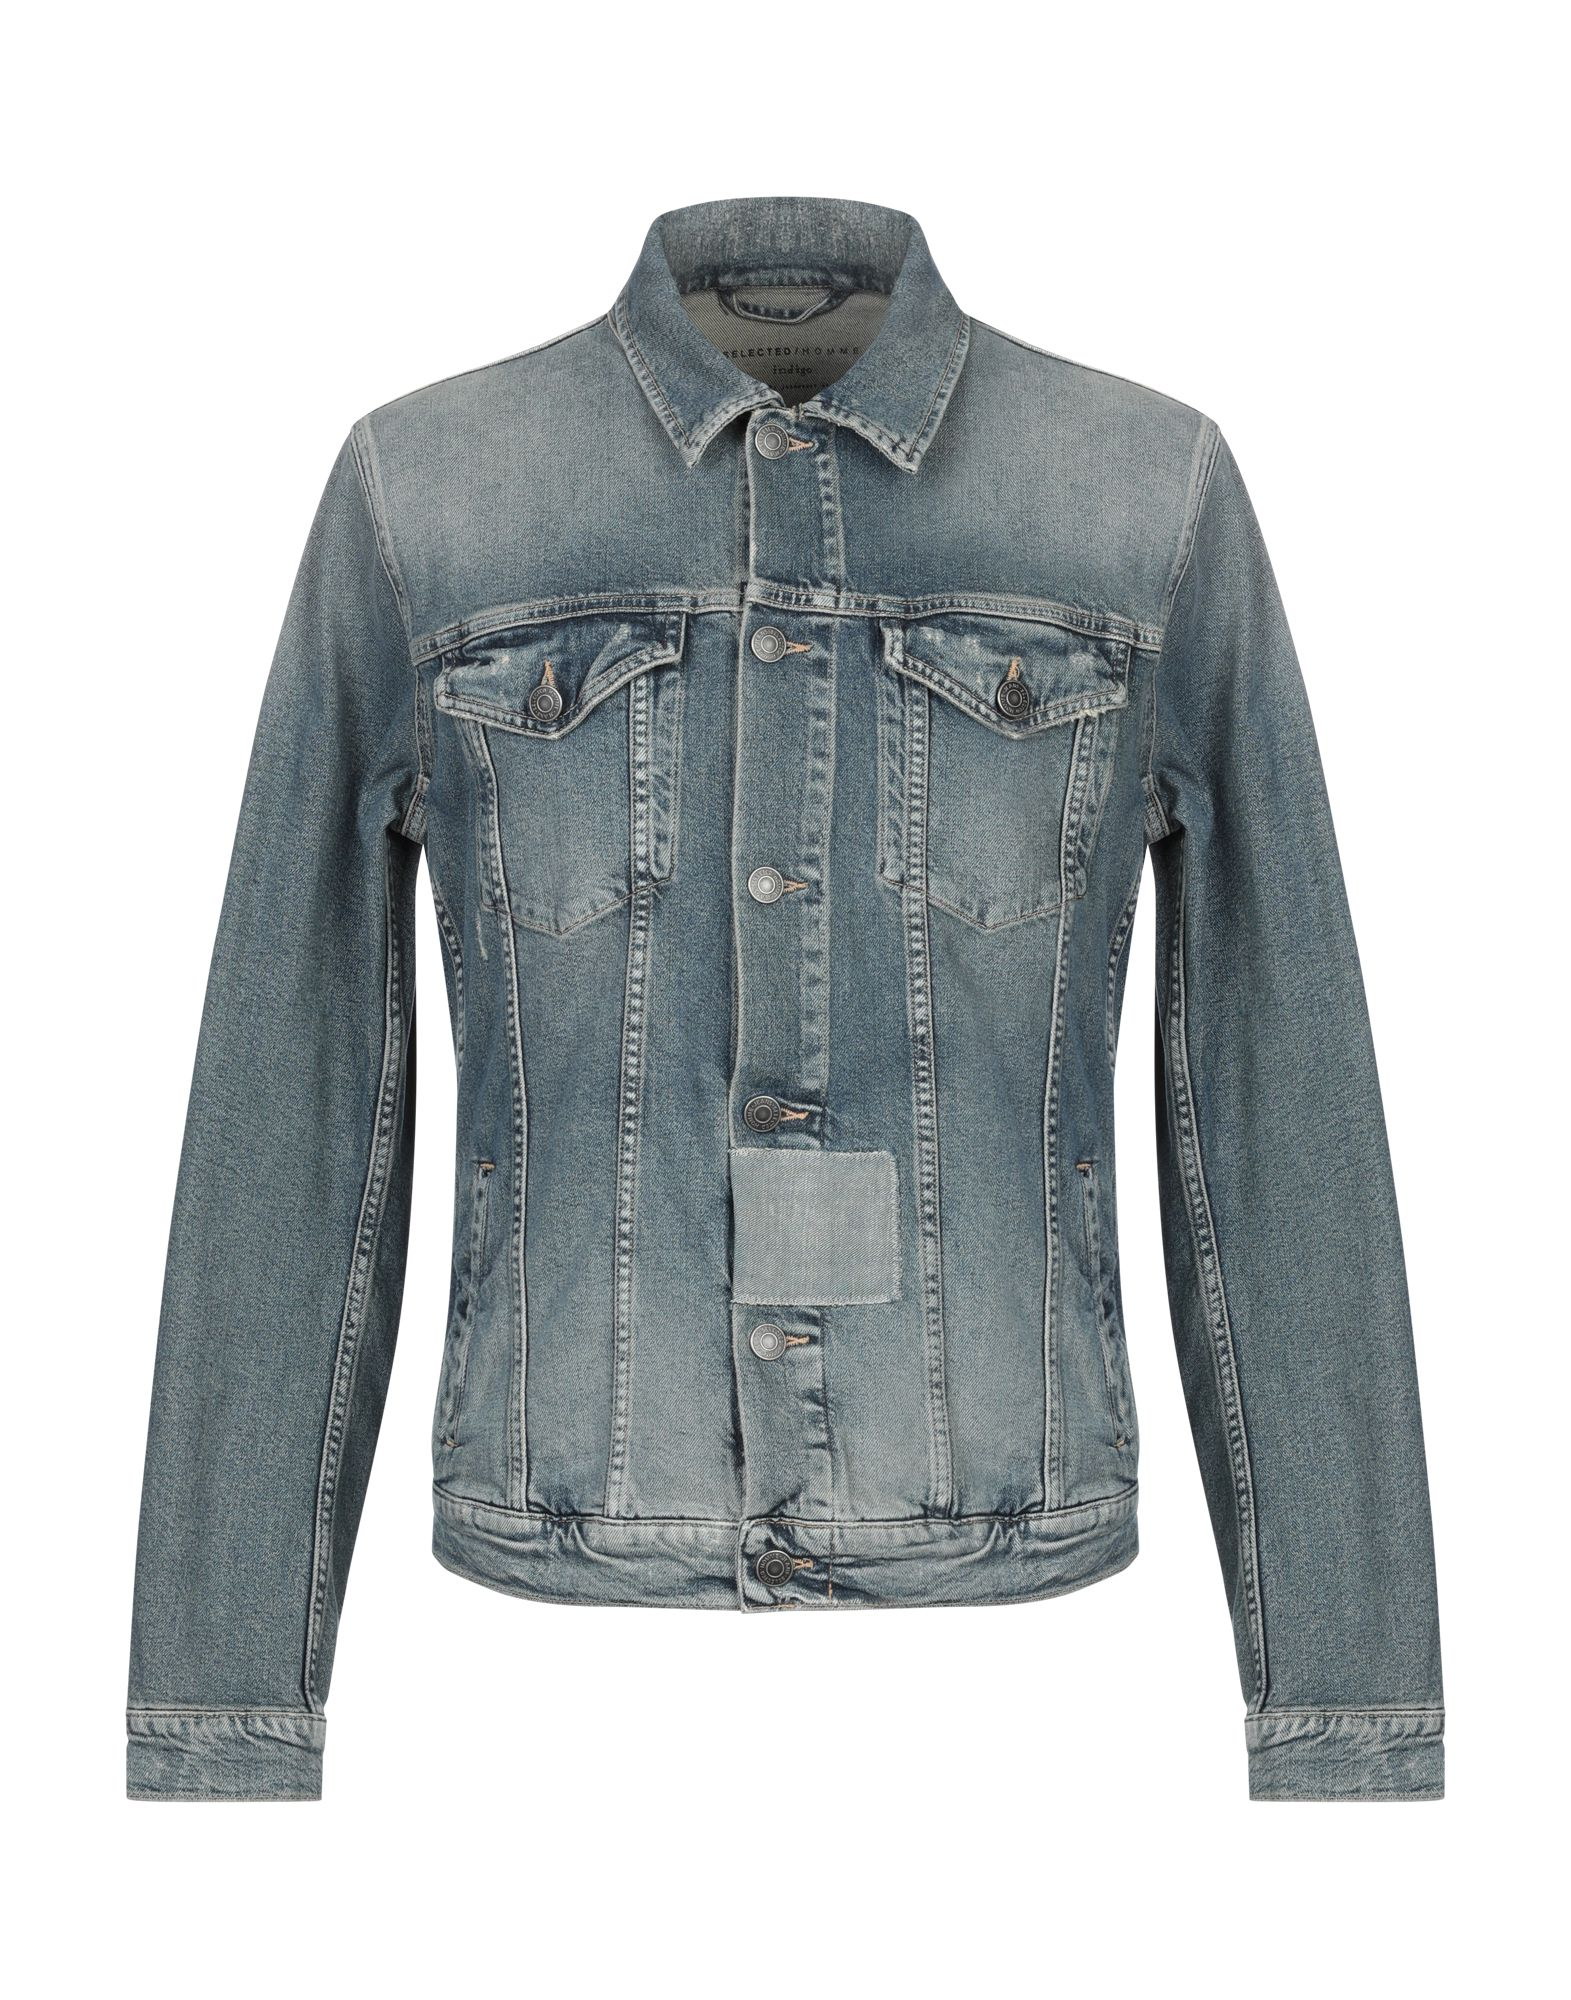 SELECTED HOMME Джинсовая верхняя одежда одежда из кожи selected sld 412428004